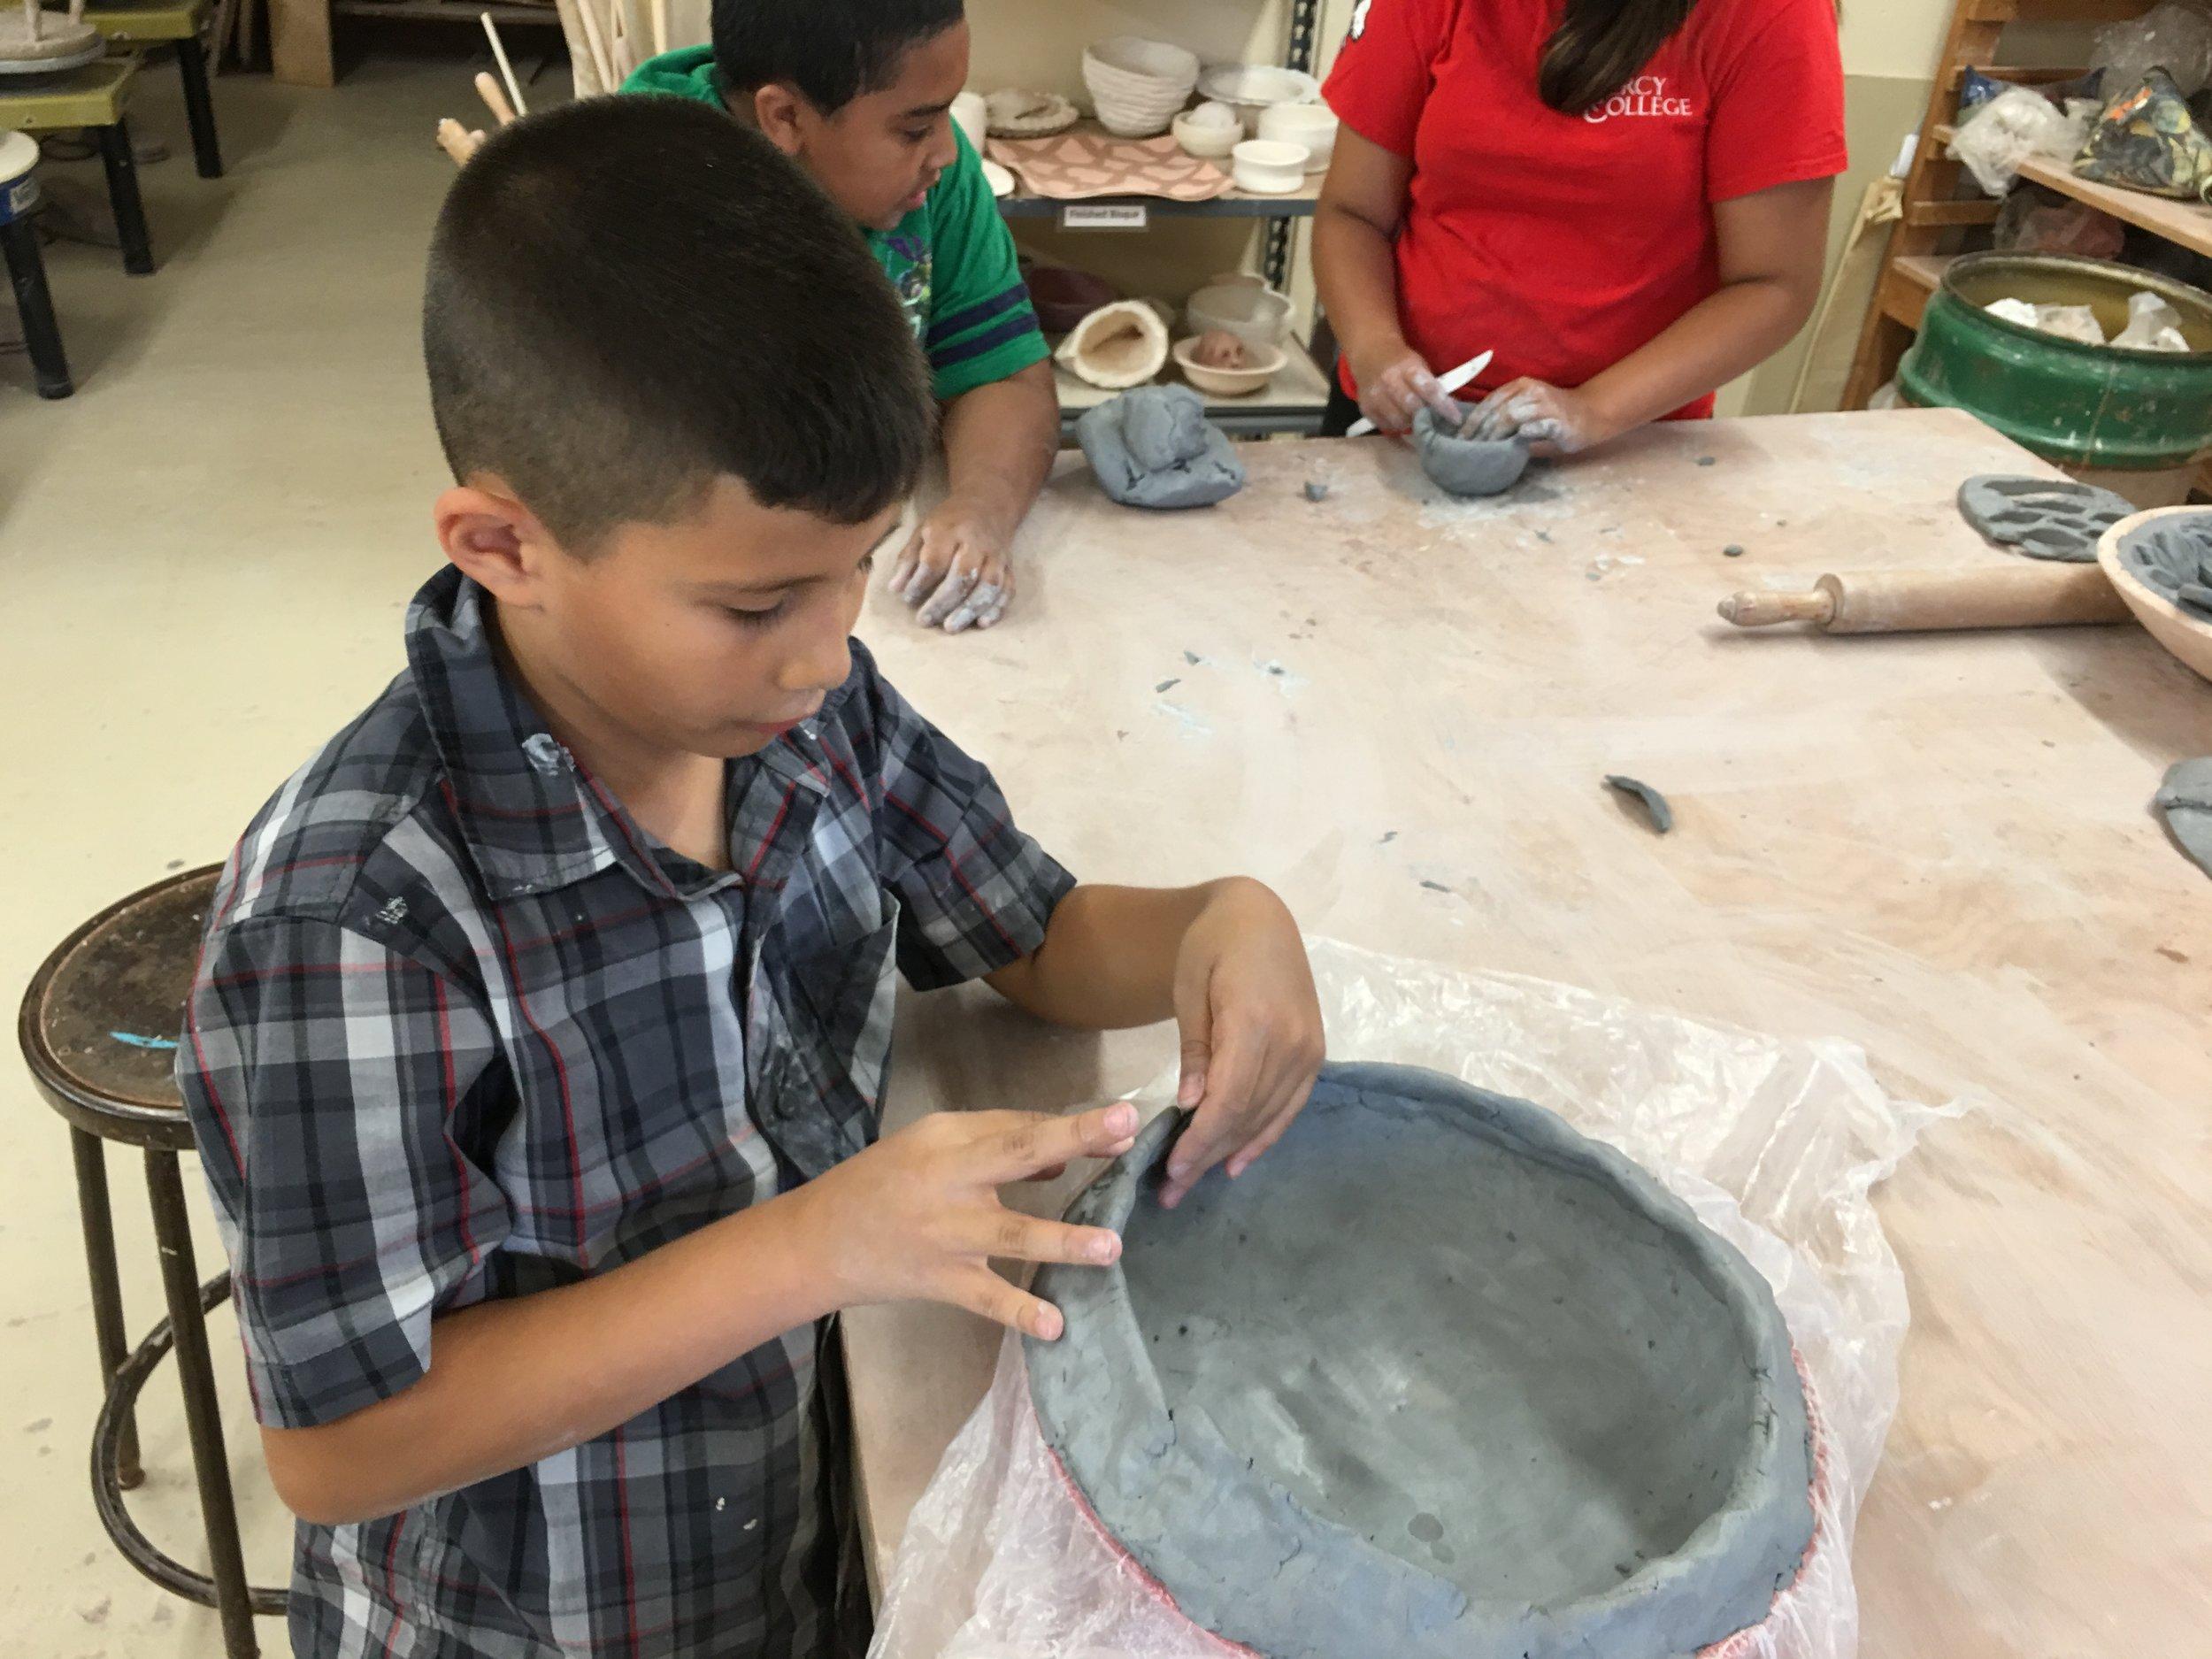 clay-art-center-kids-bring-change_28026436610_o.jpg